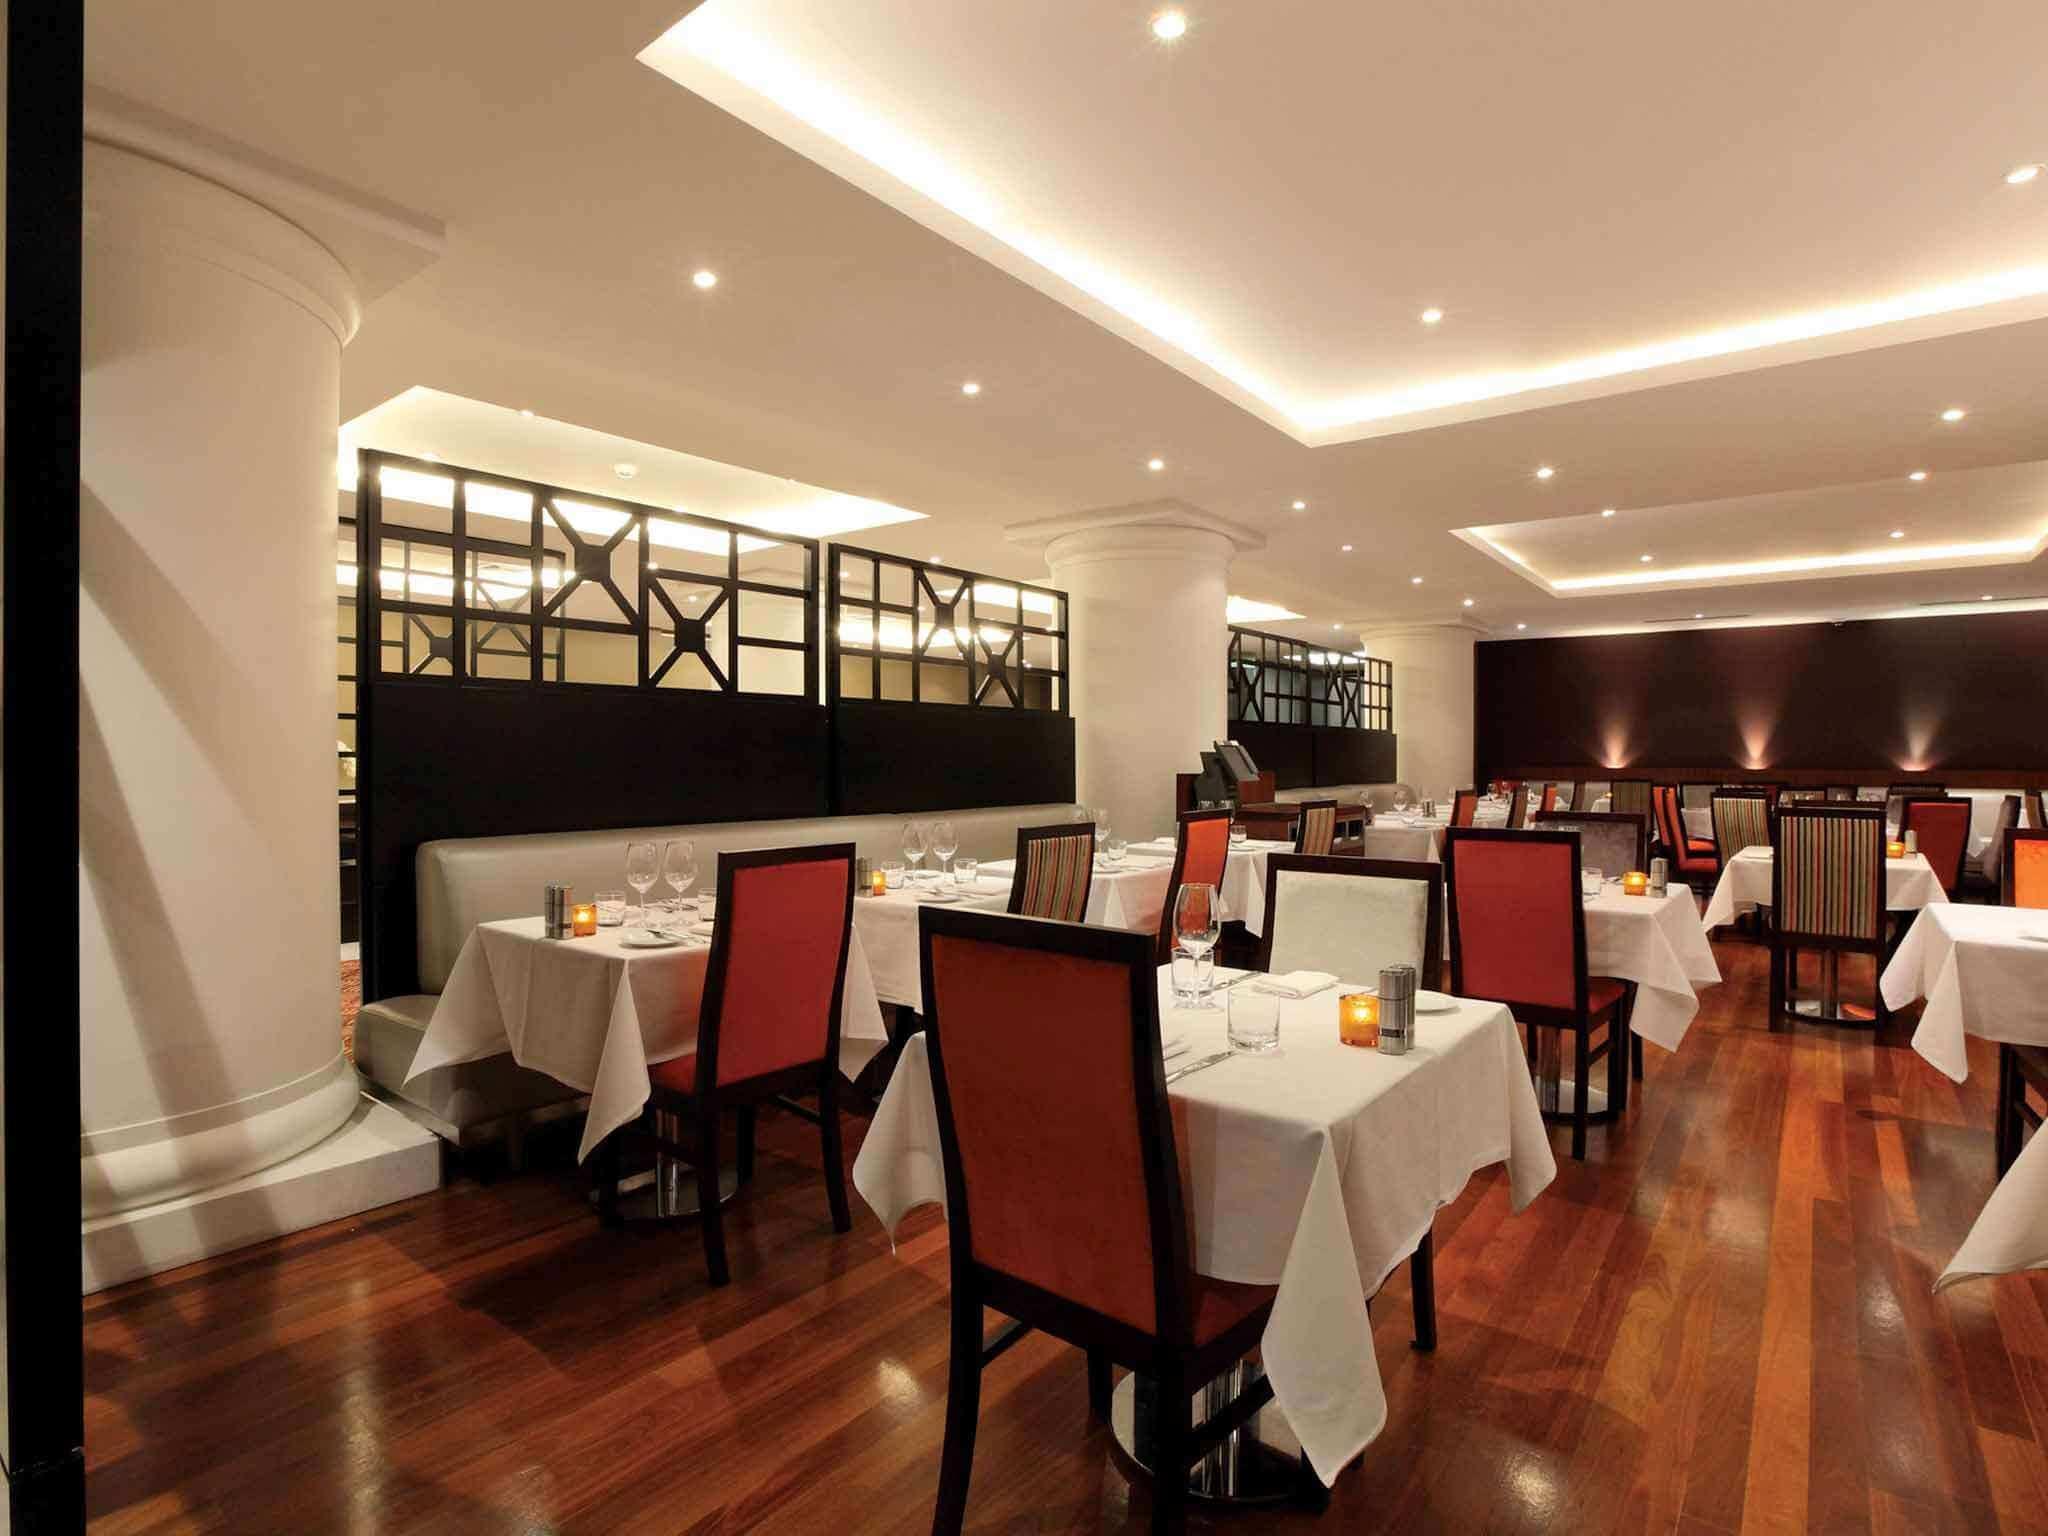 Pullman Hotel restaurant